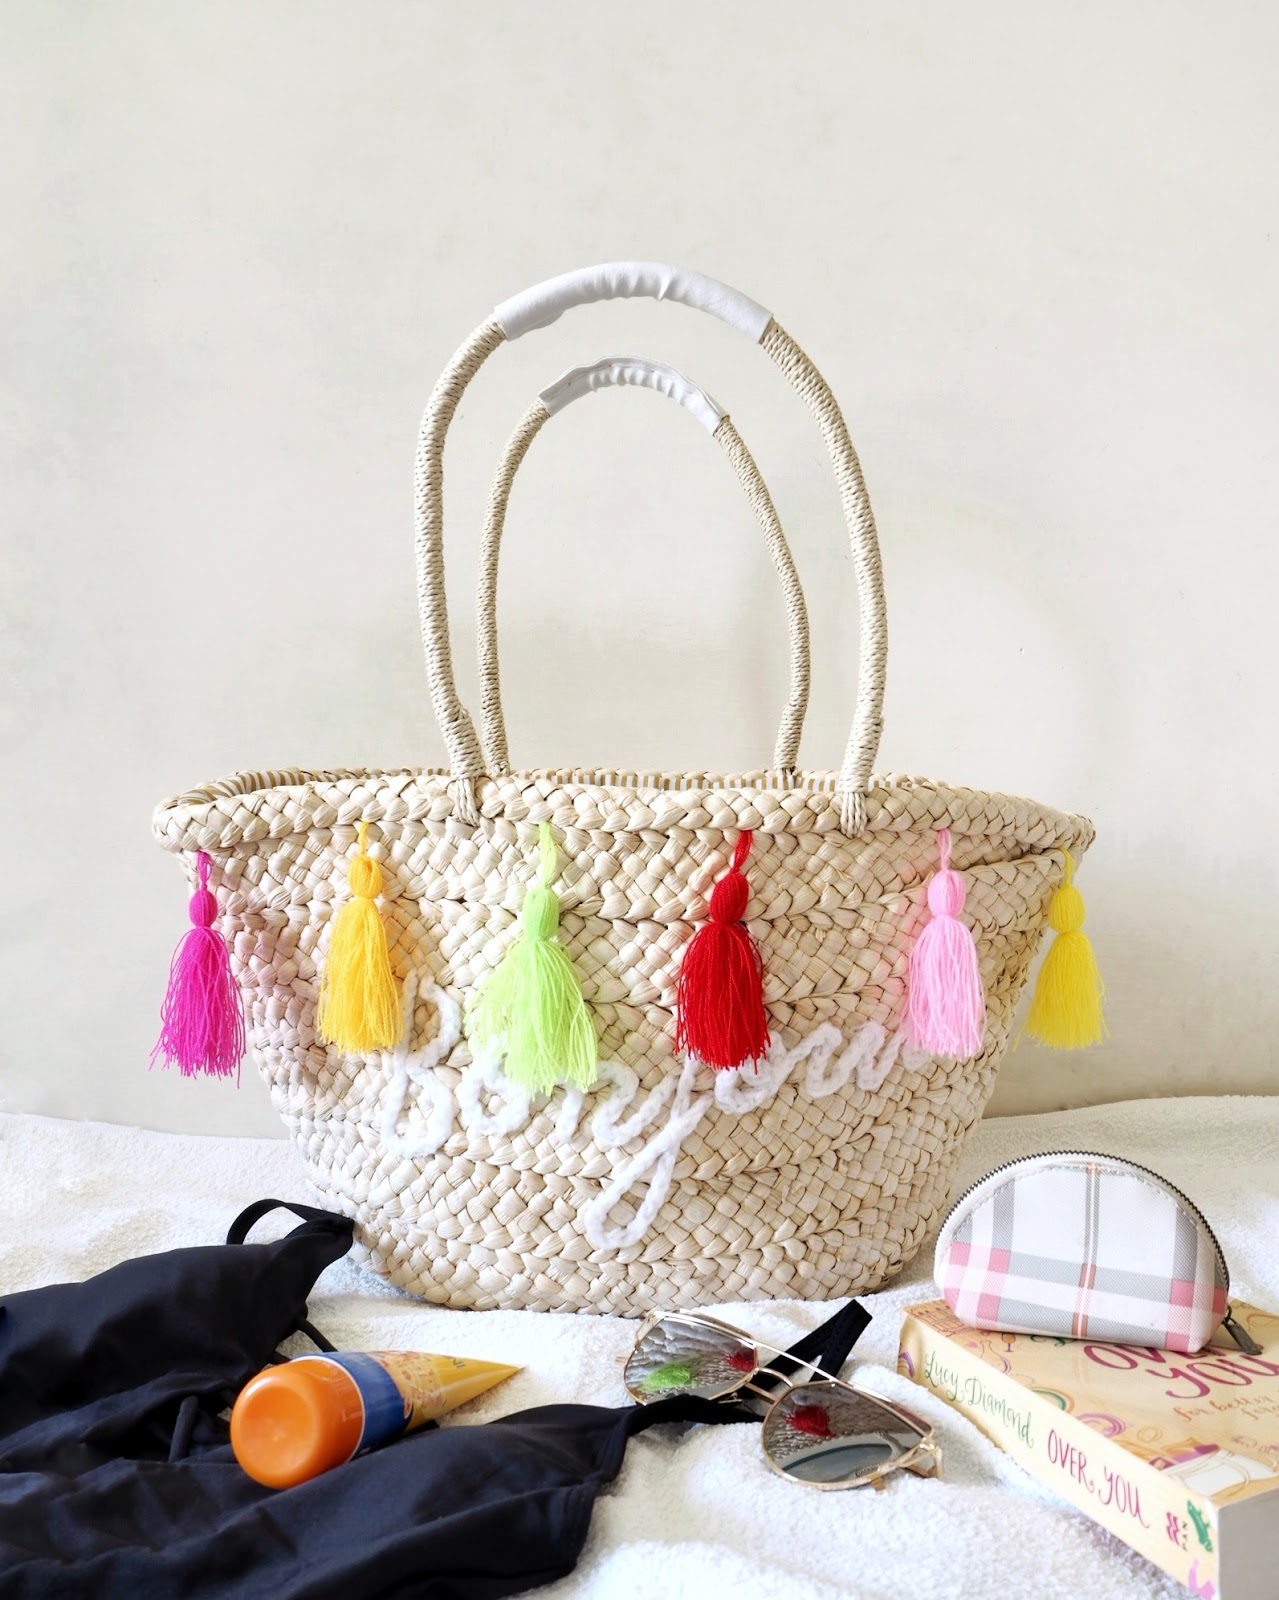 straw beach bag, rosegal straw bag, beach bag essentials